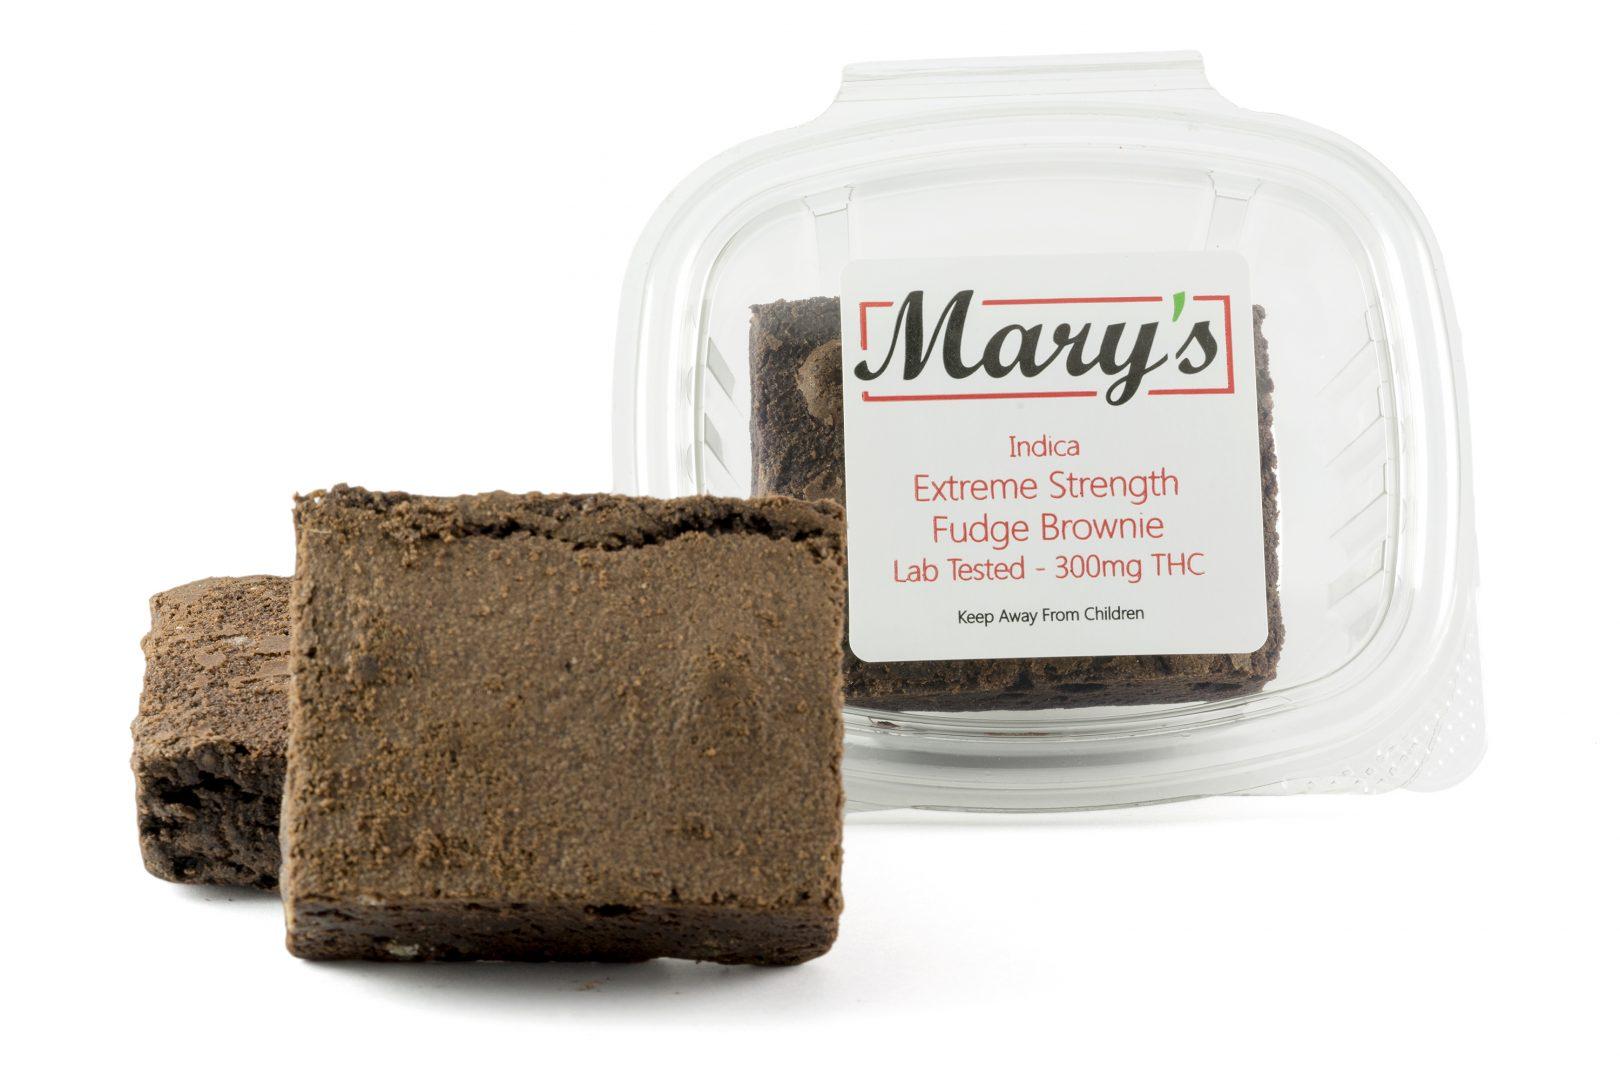 Marys Fudge Brownie